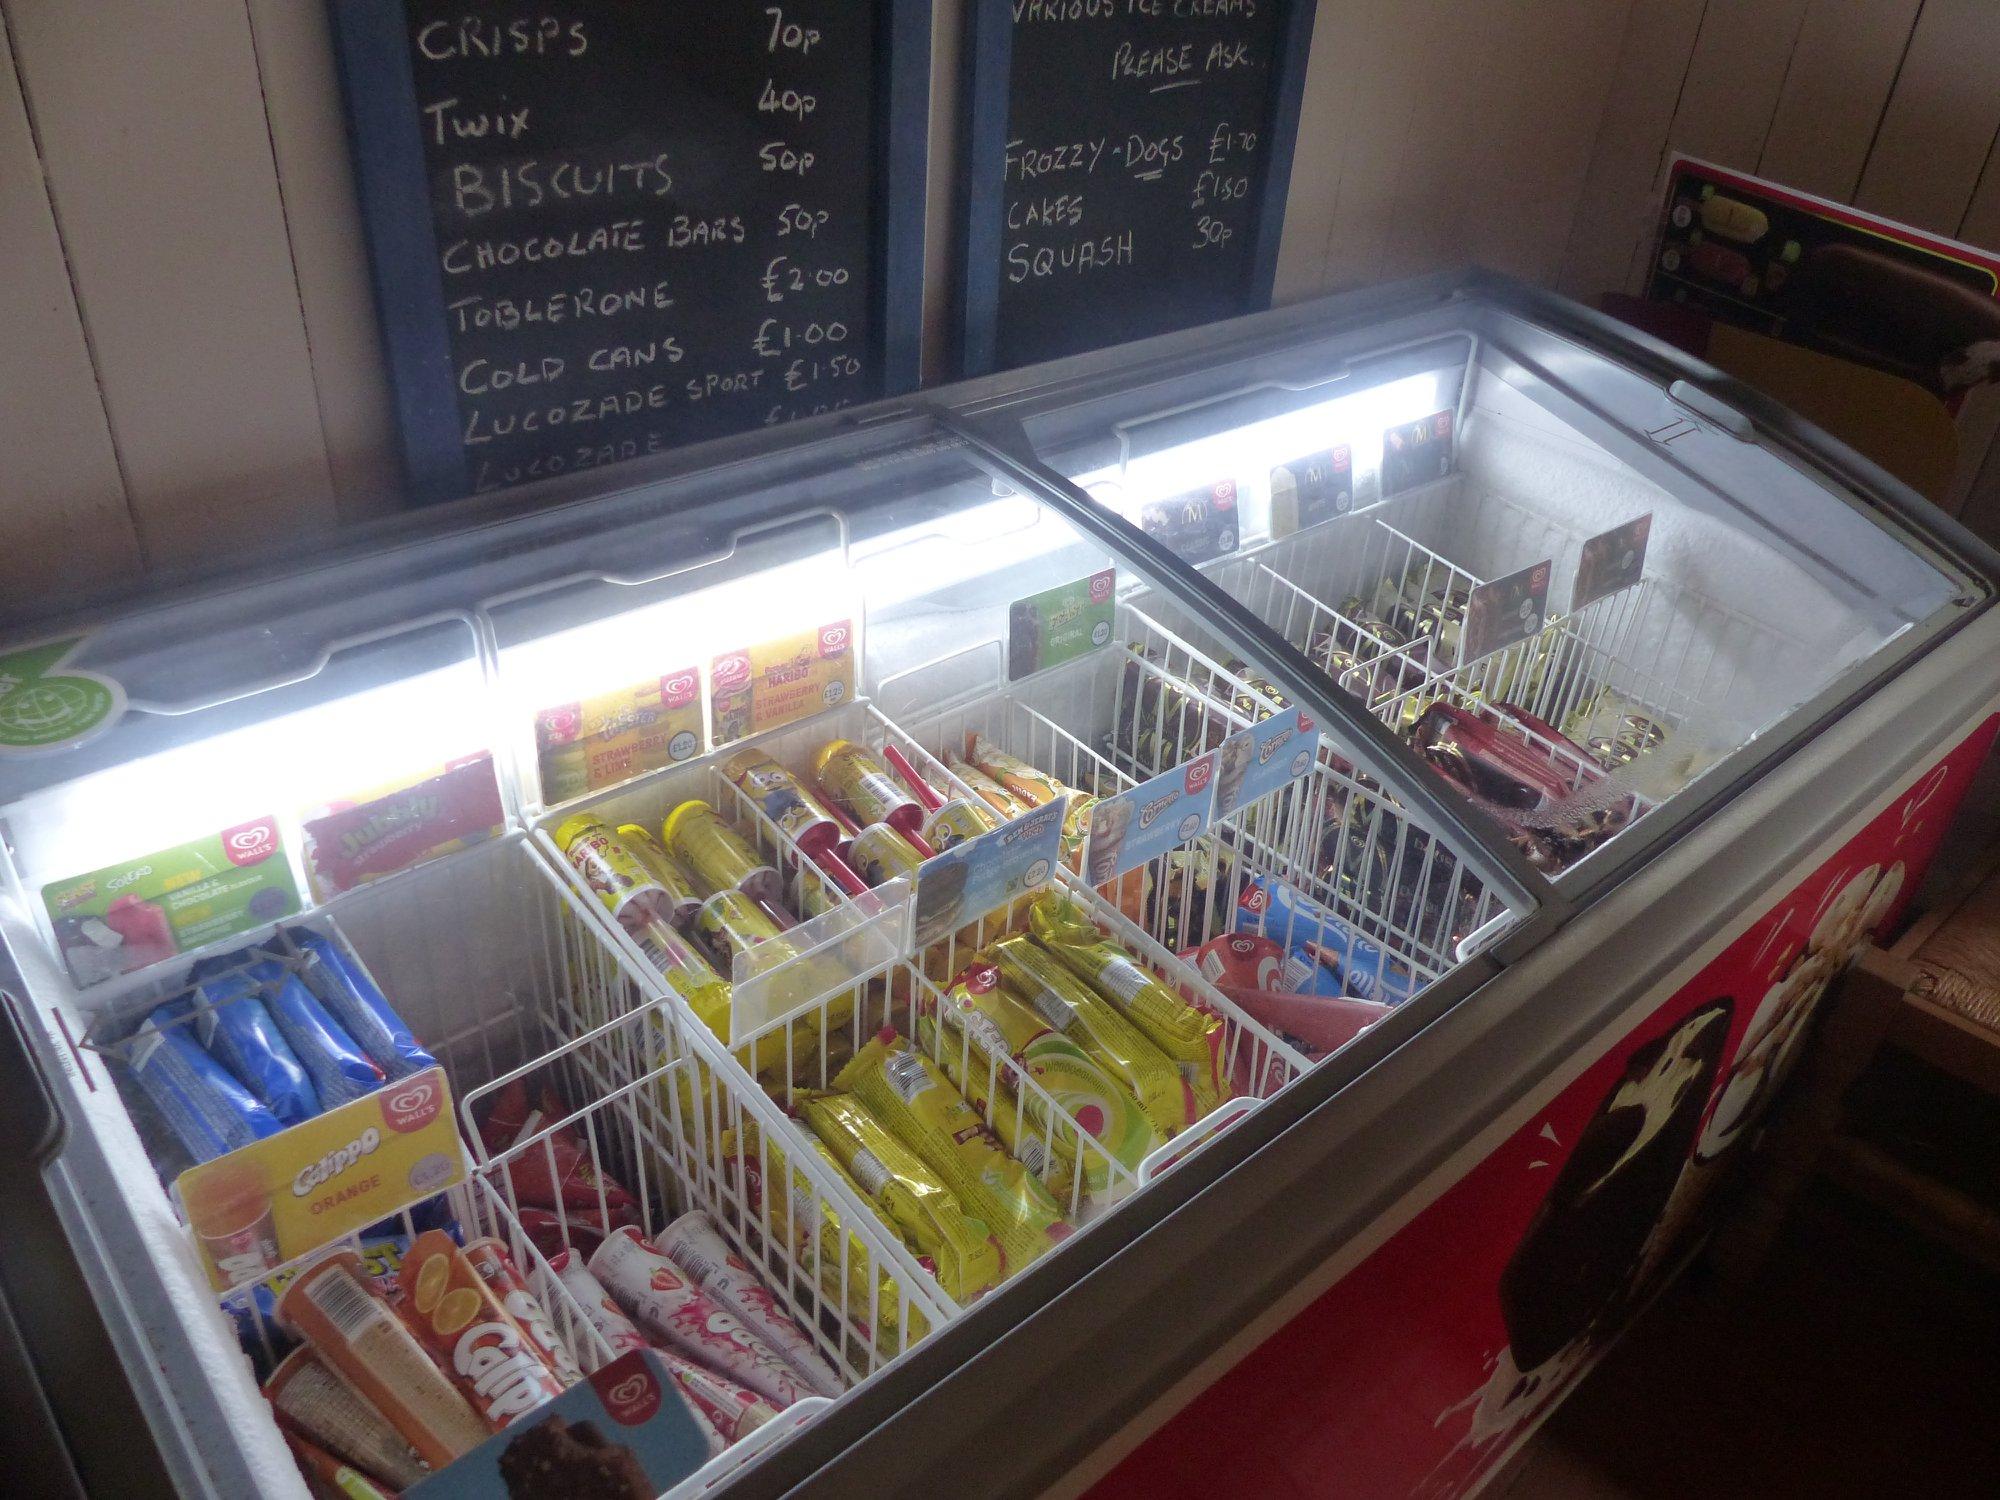 Halfway House Freezer pantry